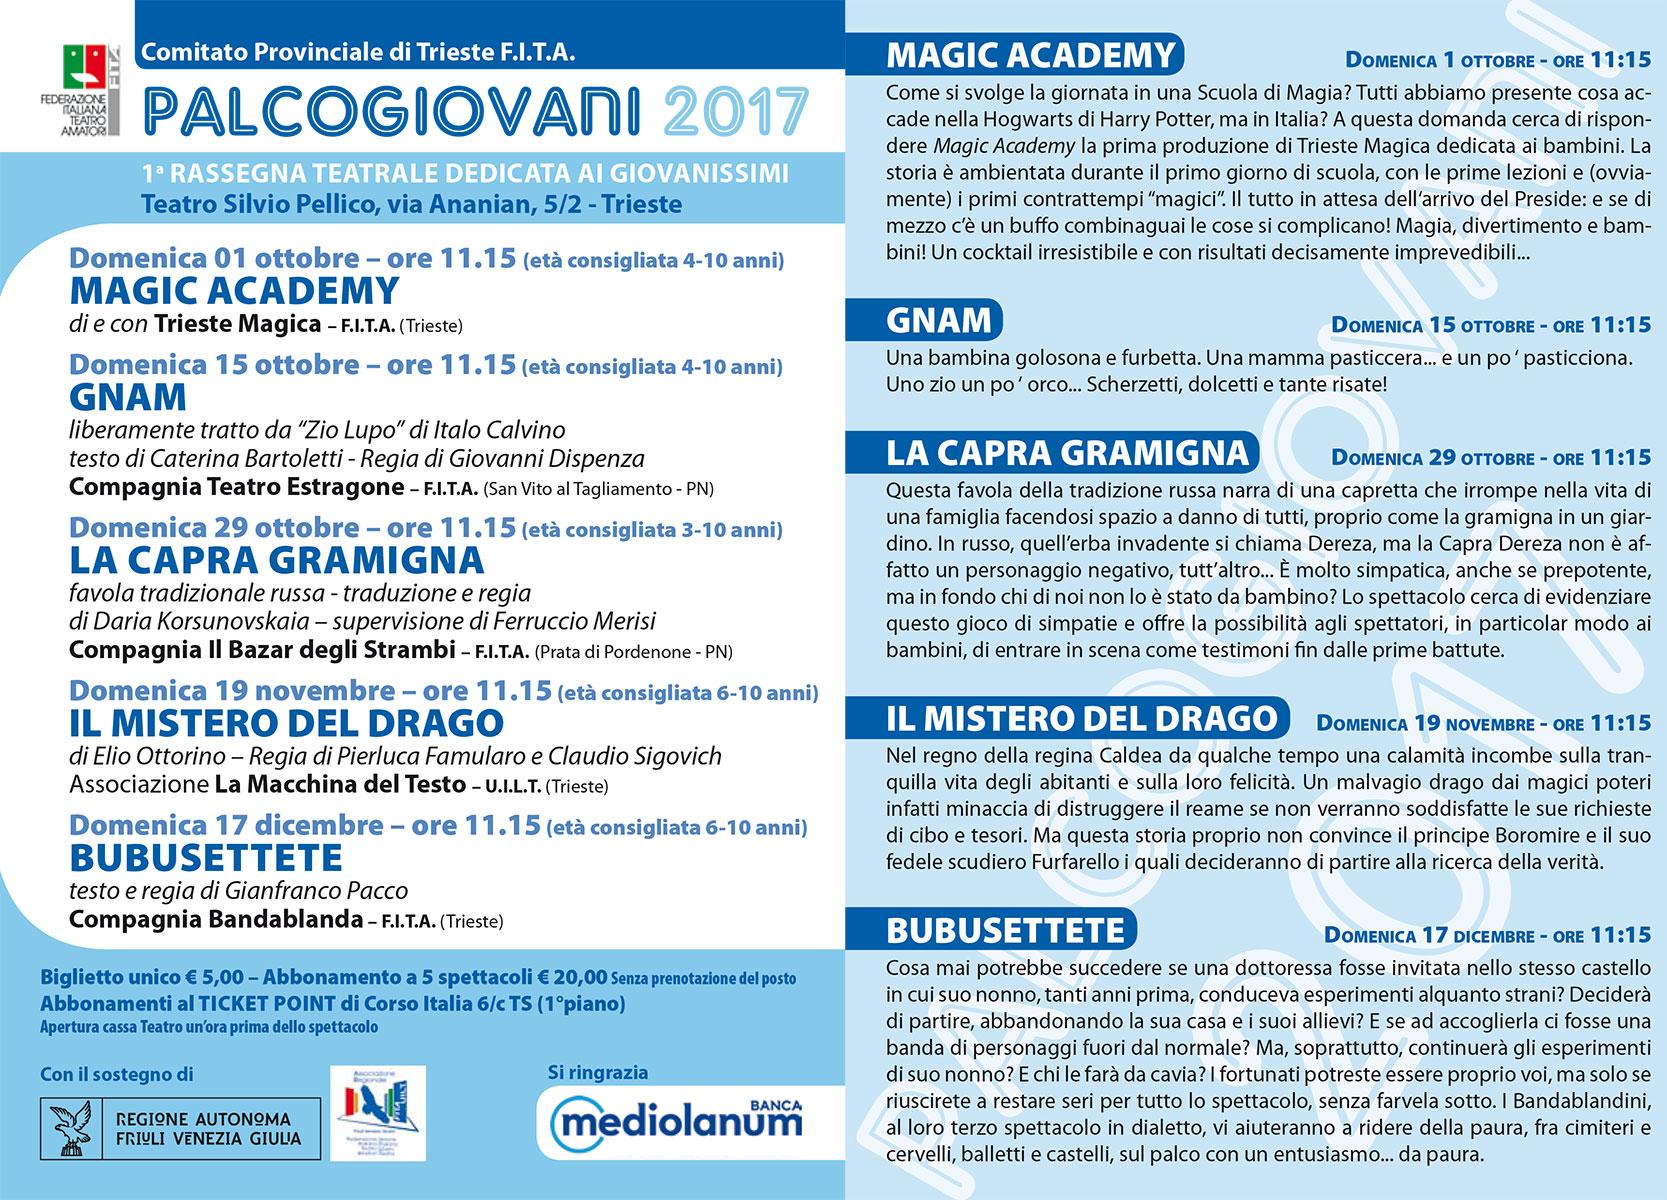 Palcogiovani 2017 programma